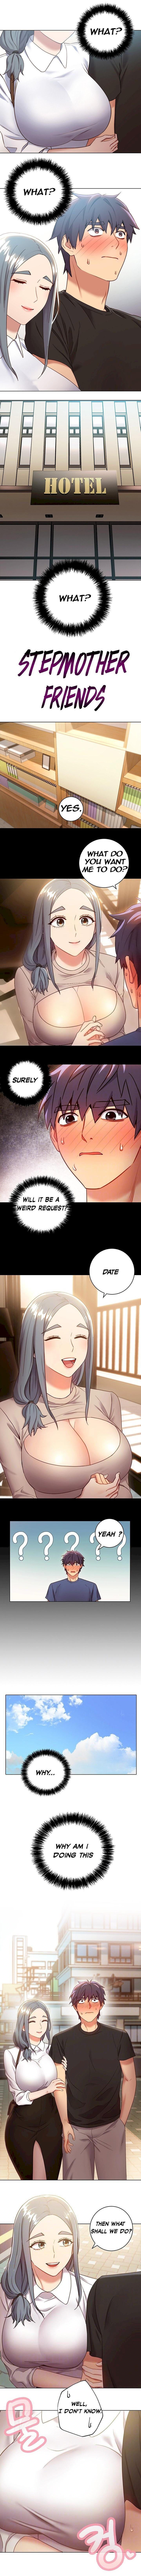 [Neck Pilllow] Stepmother Friends Ch.39/? [English] [Hentai Universe] NEW! 13/10/2020 197